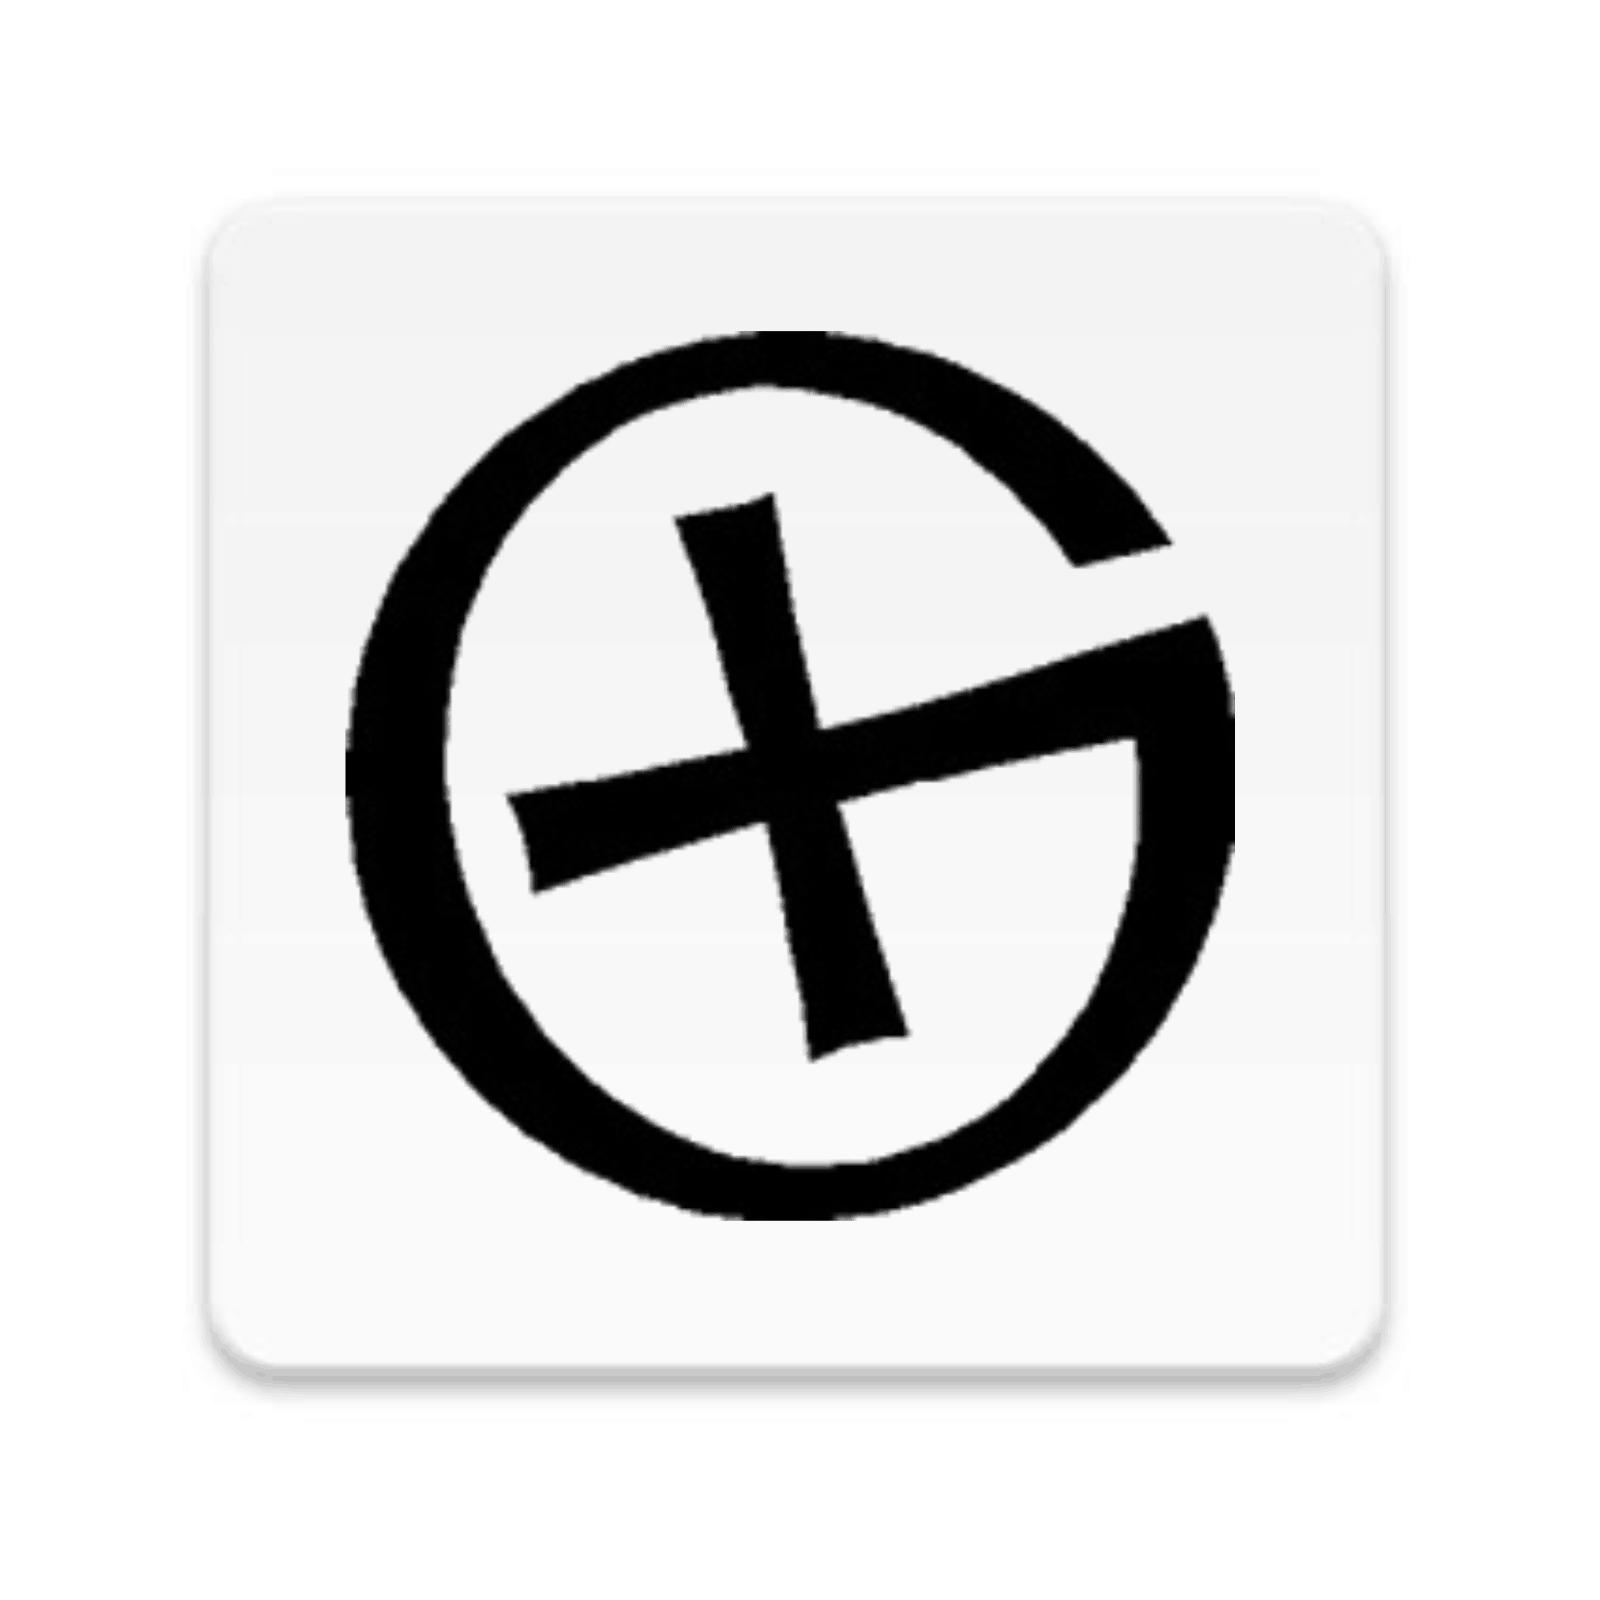 Geocaching Logo Image Aluminium Drinks Coaster or Plaque Great Gift.